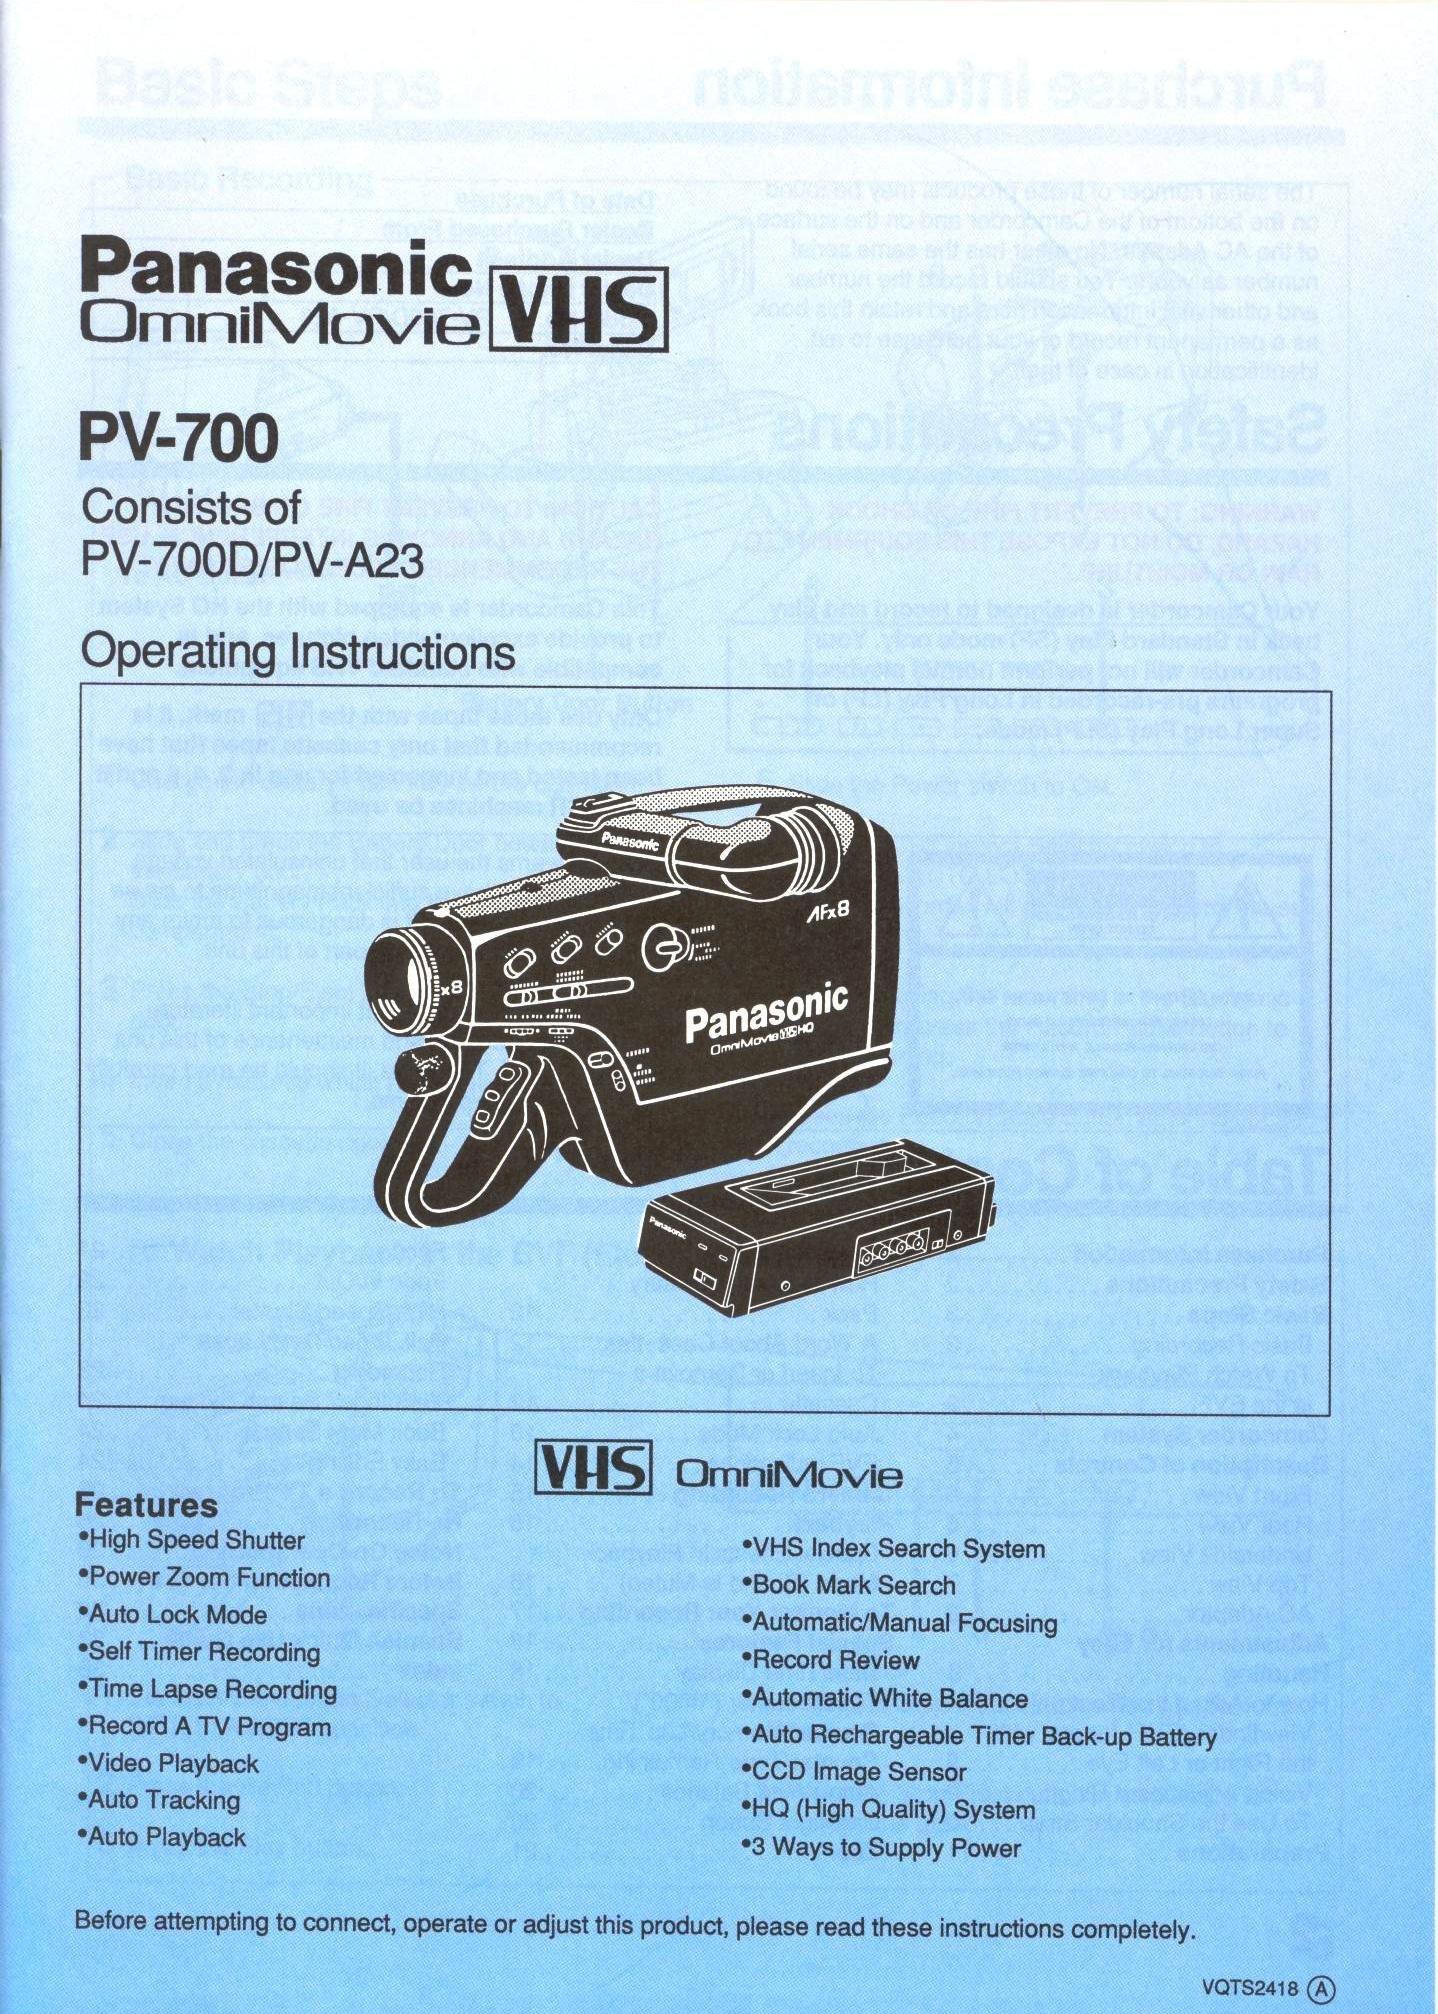 Panasonic vcr user manuals ebook array panasonic omnimovie vhs pv 700 pv 700d pv a23 instruction manual rh amazon com fandeluxe Gallery